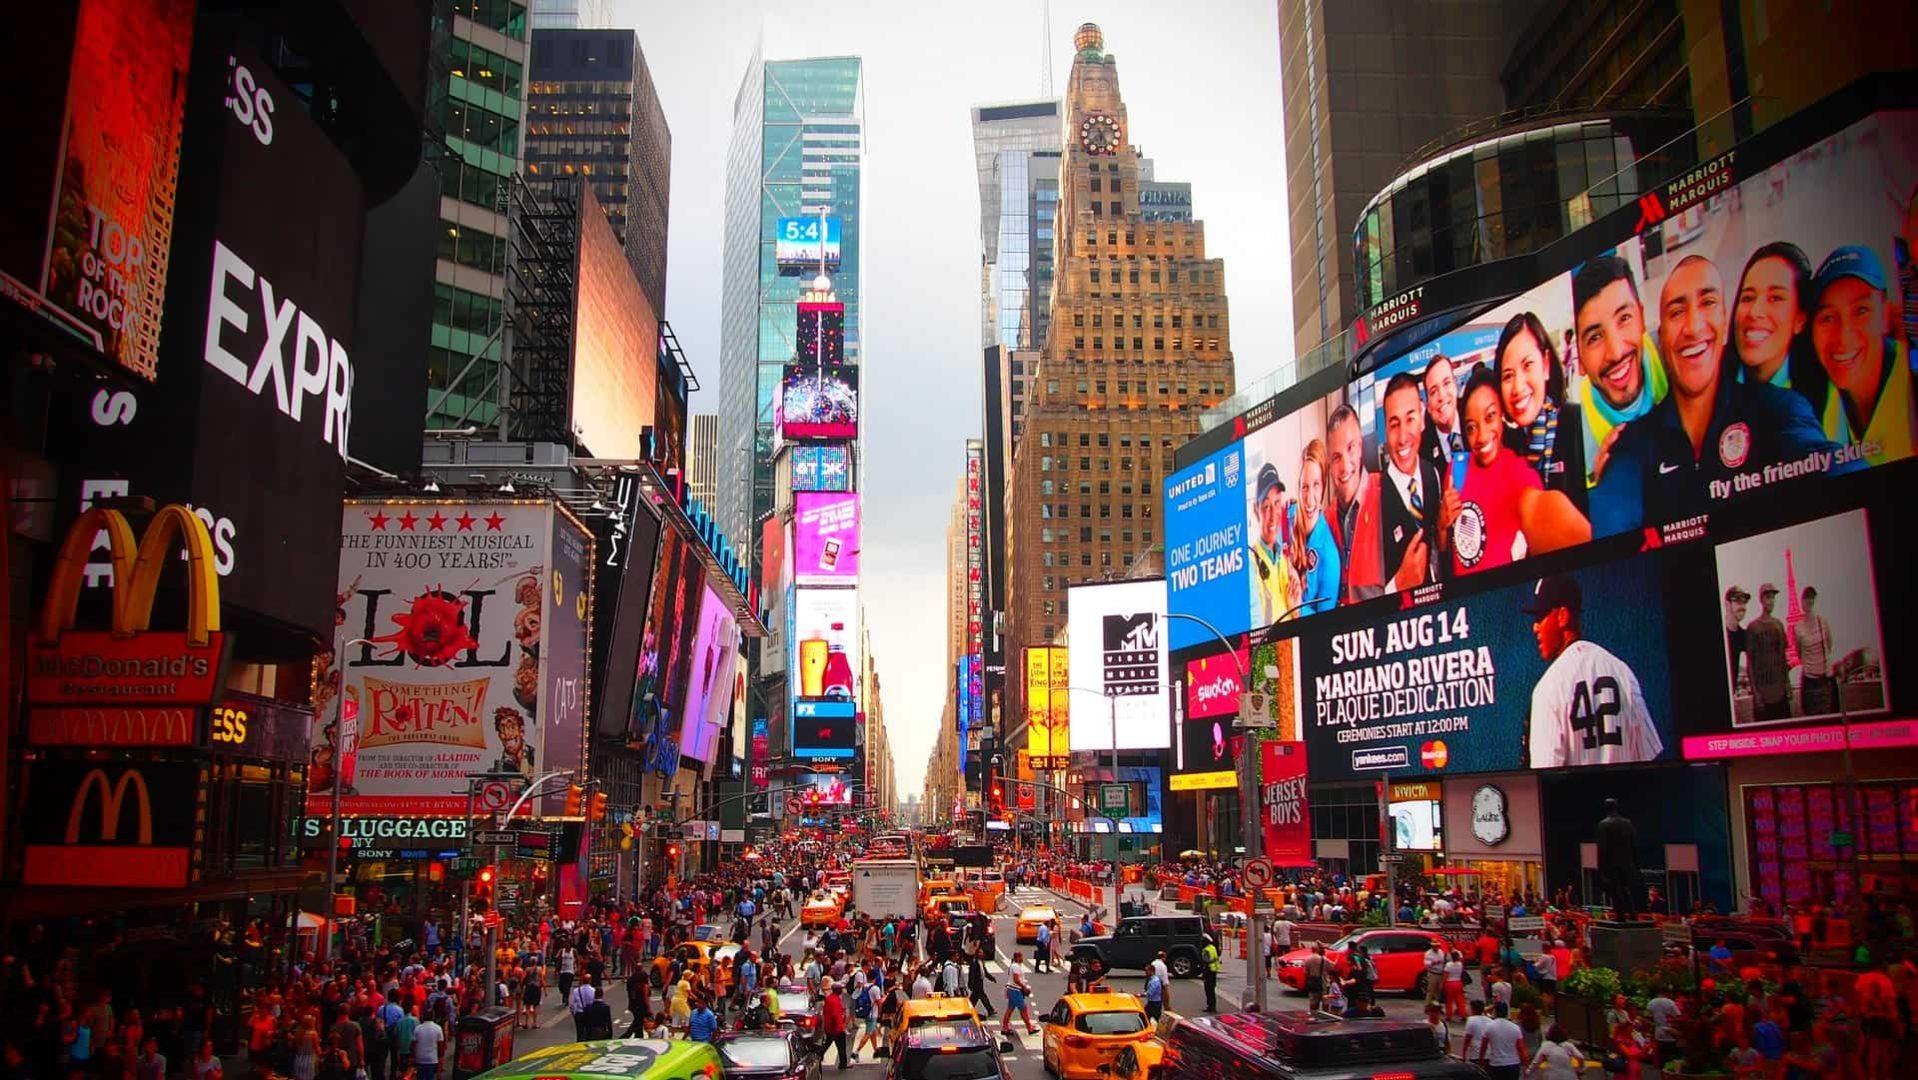 Gay Νέα Υόρκη · Πολυτελή ξενοδοχεία